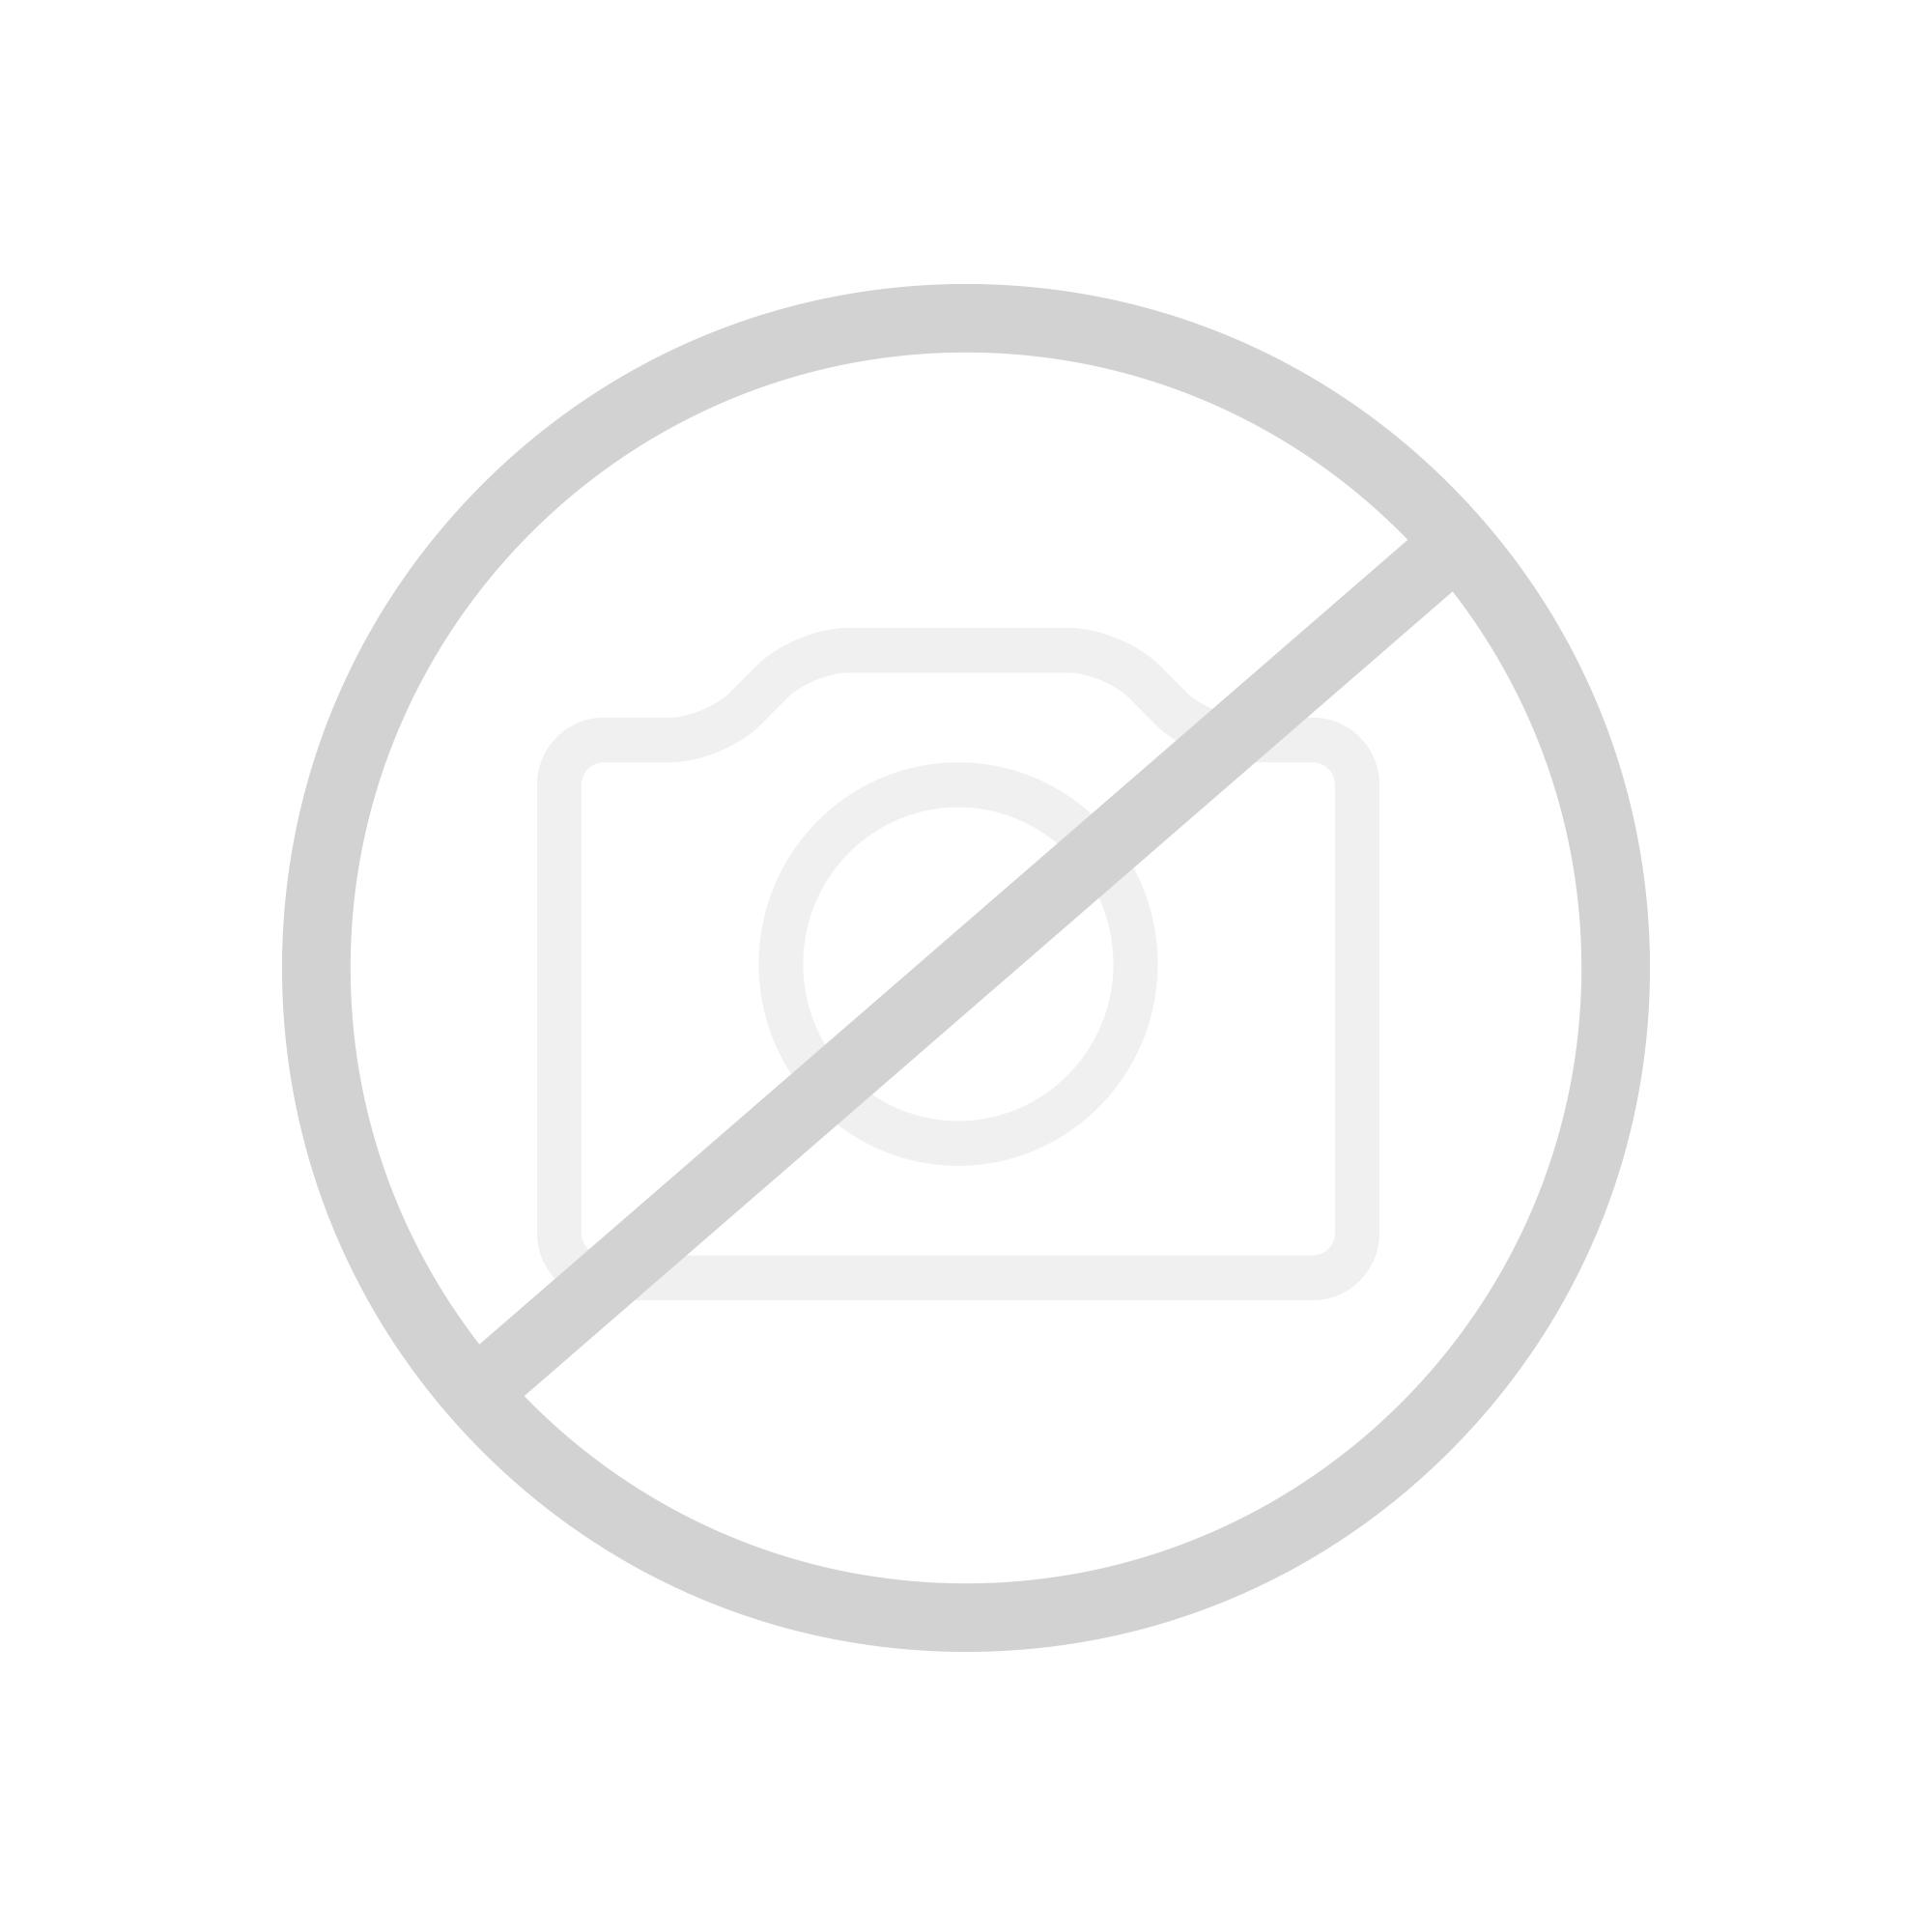 geberit ap sp lkasten ap127 mit sp l stopp sp lung wa unten rechts 127023111 reuter onlineshop. Black Bedroom Furniture Sets. Home Design Ideas